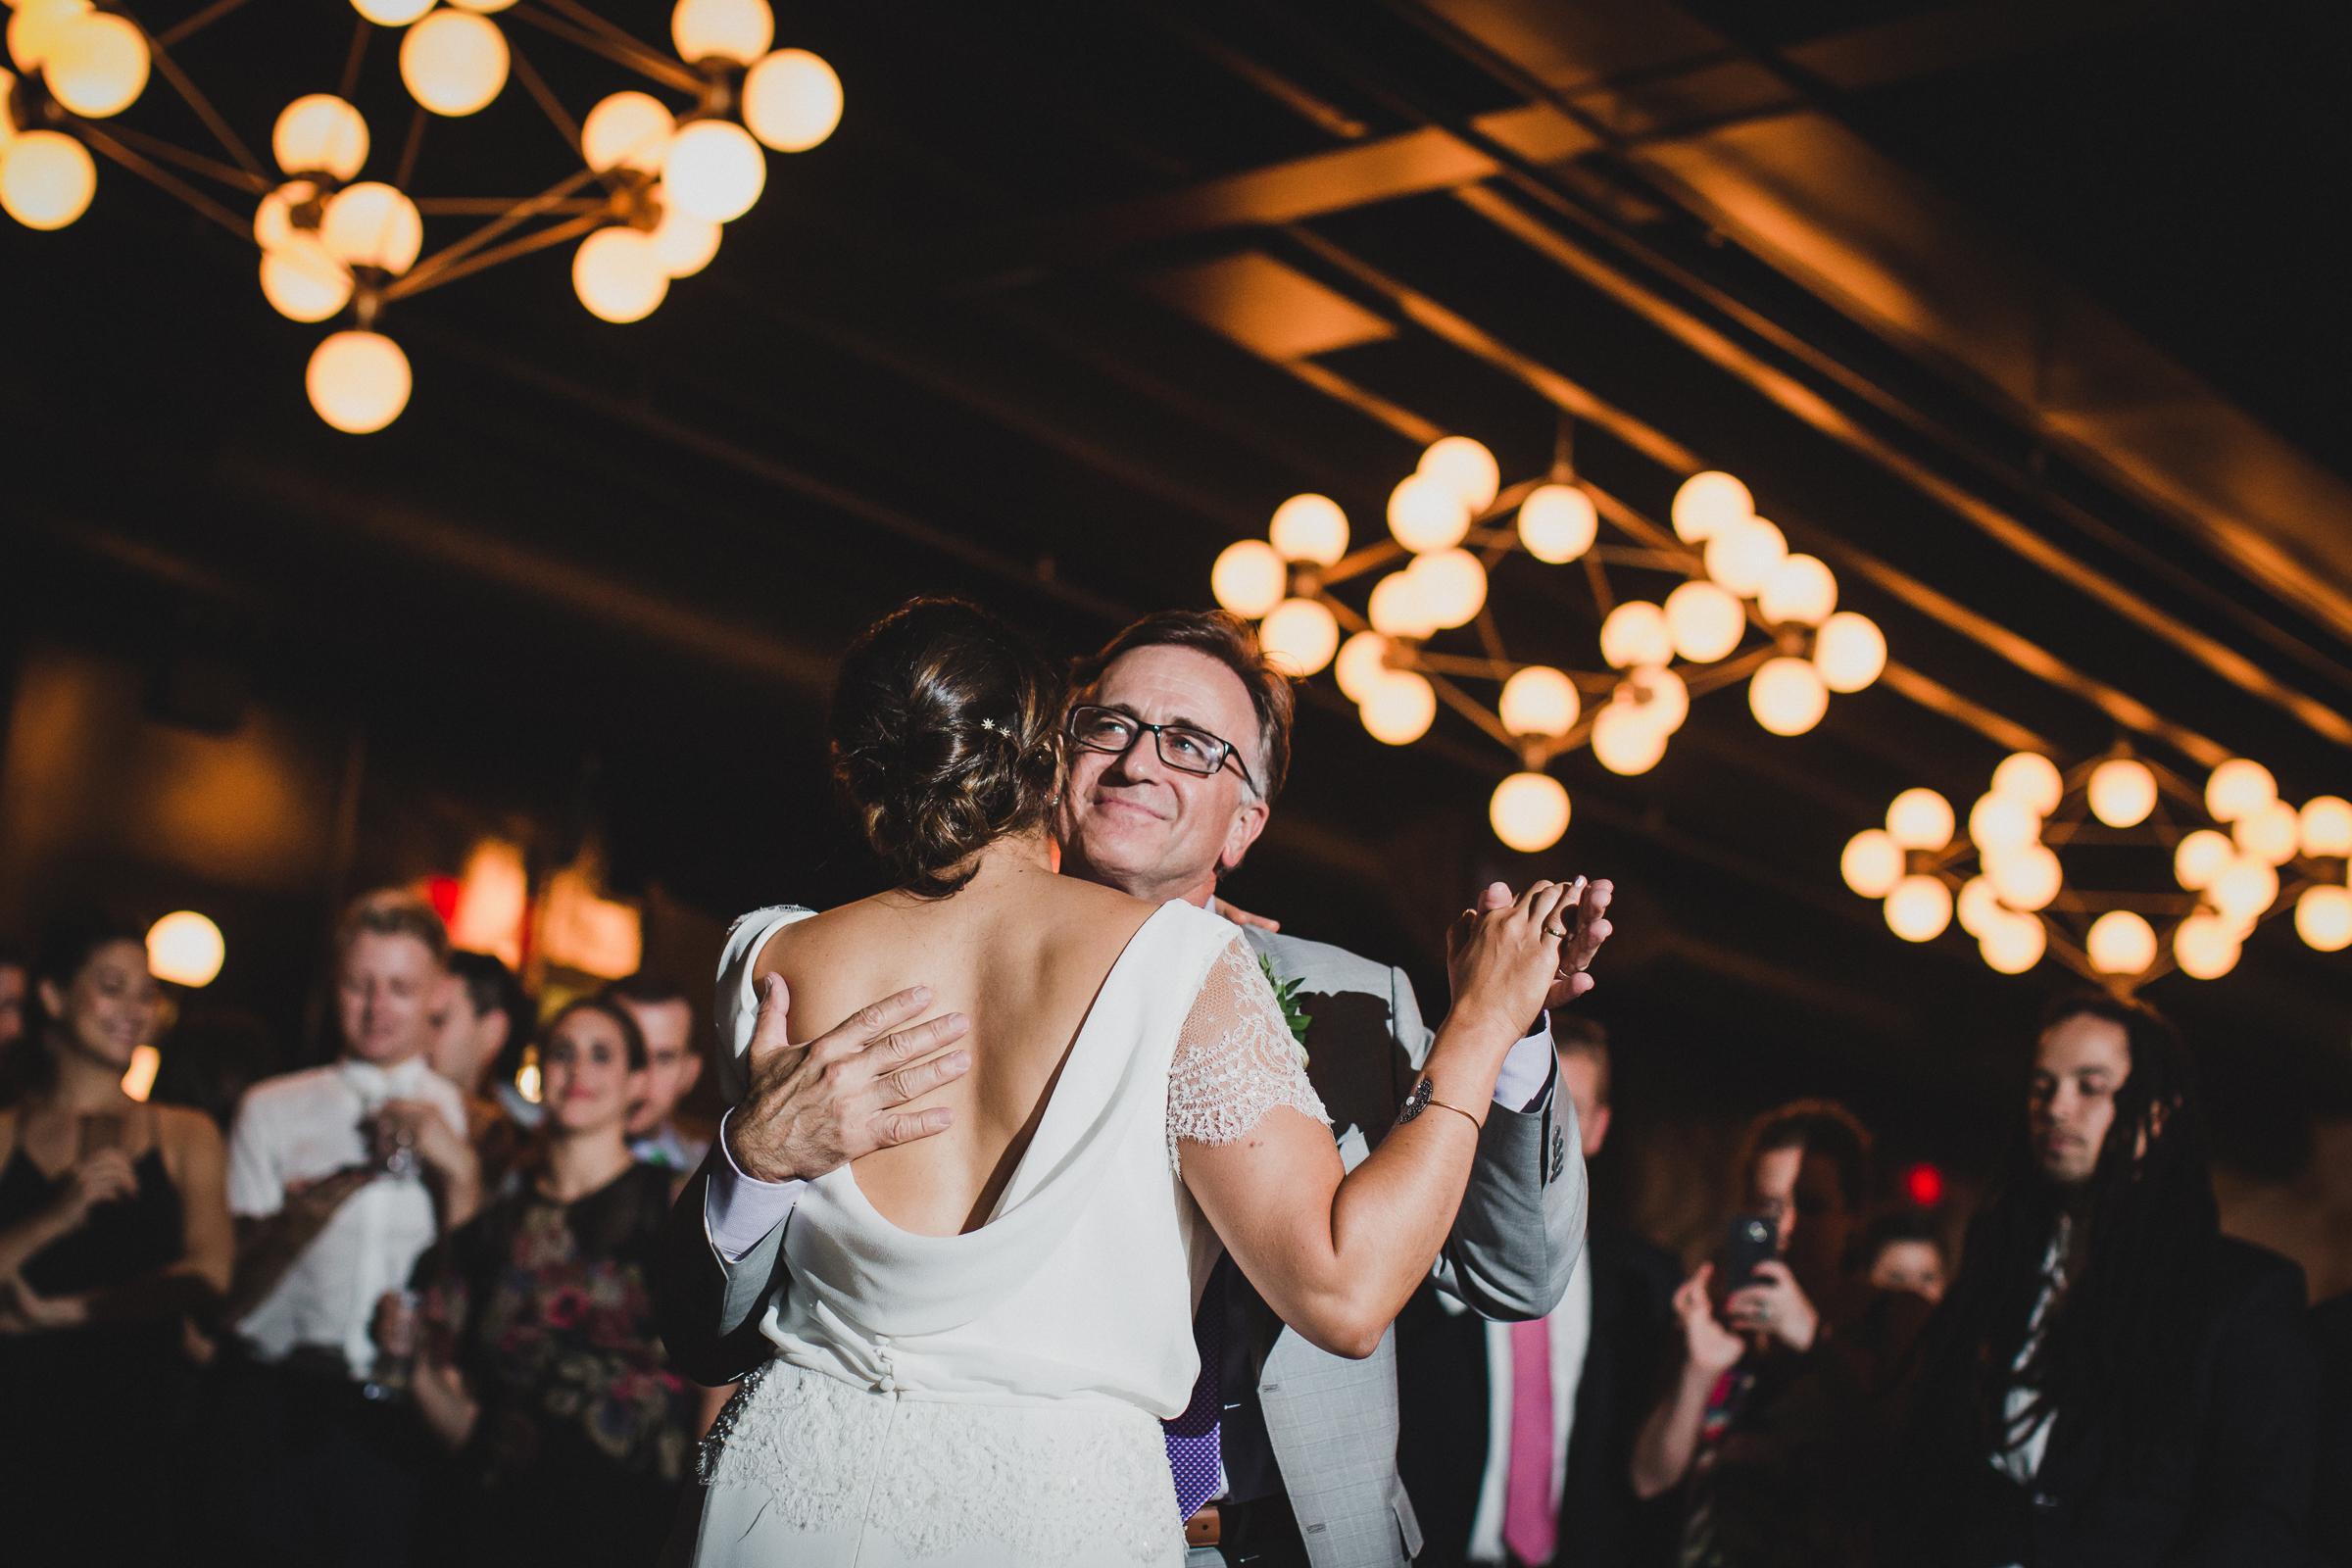 501-Union-Brooklyn-Fine-Art-Documentary-Wedding-Photographer-132.jpg